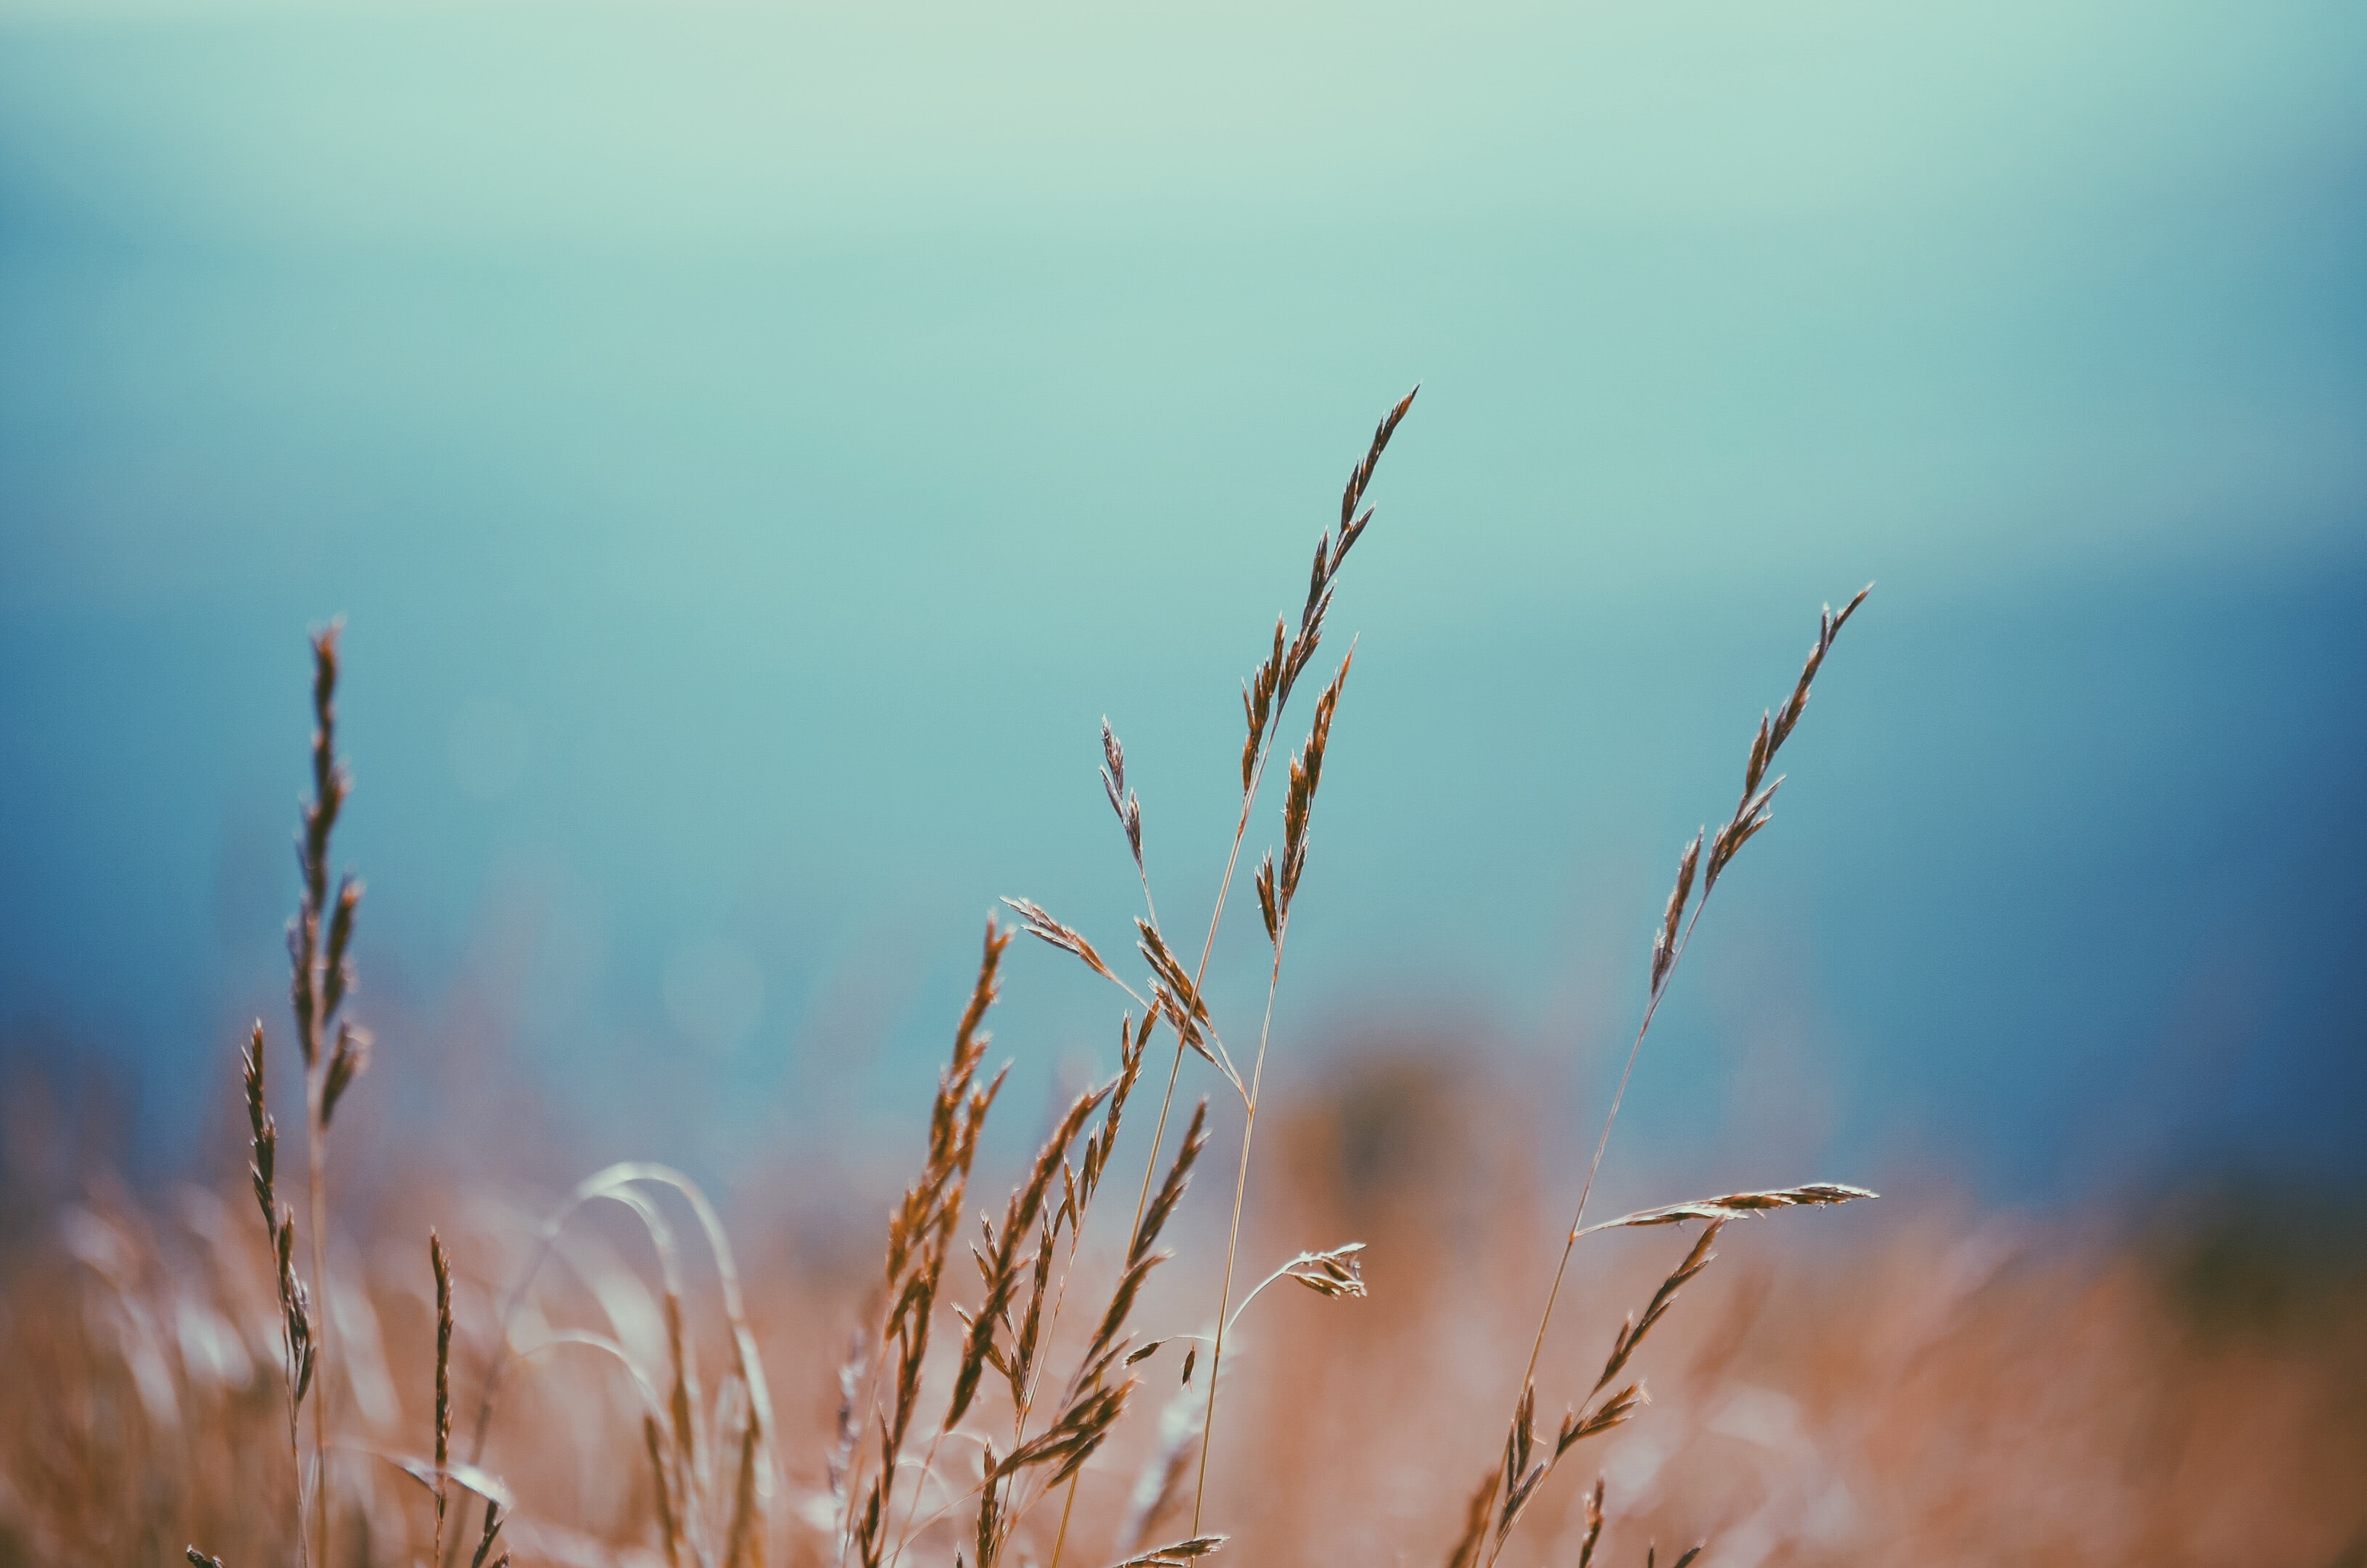 A few blades of a golden grass against a blurry background